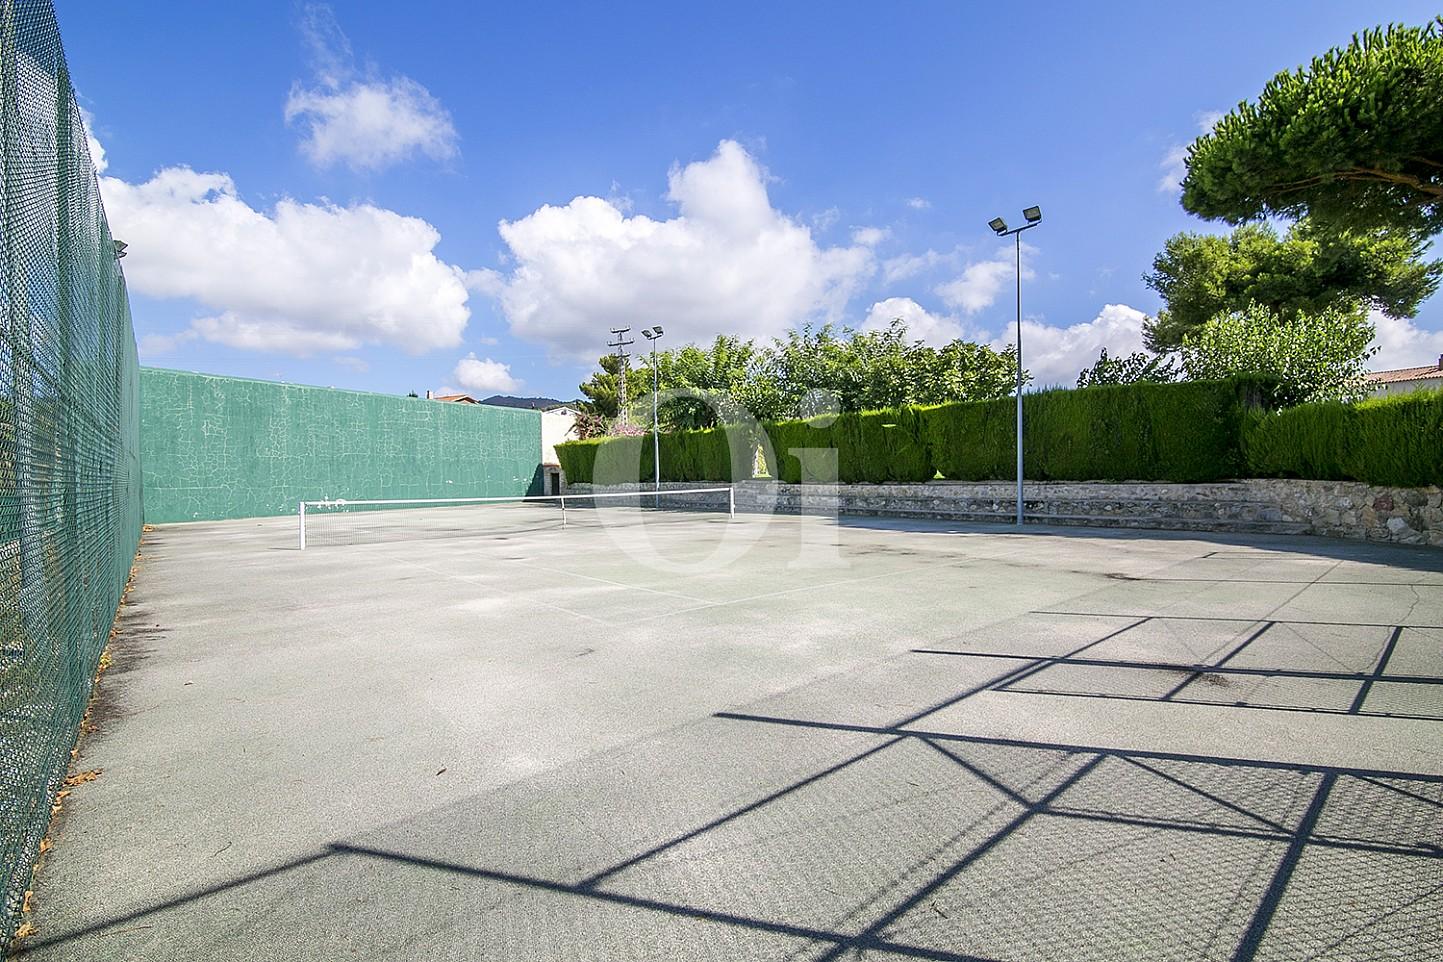 pista de tenis  de maravillosa casa en venta en Mongat, Maresme